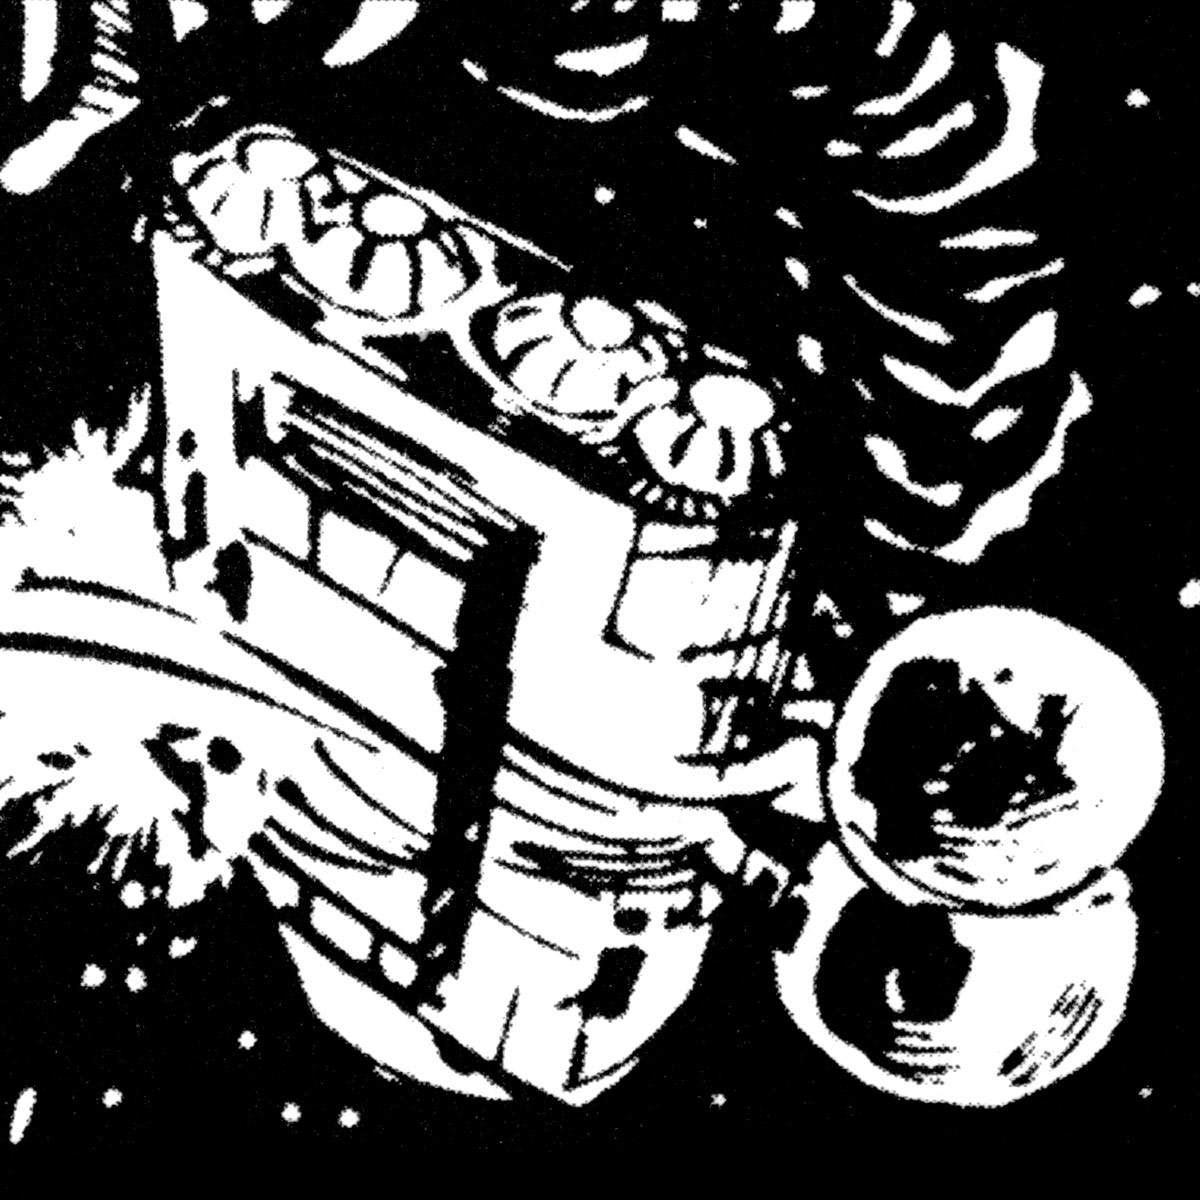 Copernicus (two-man shuttlecraft)